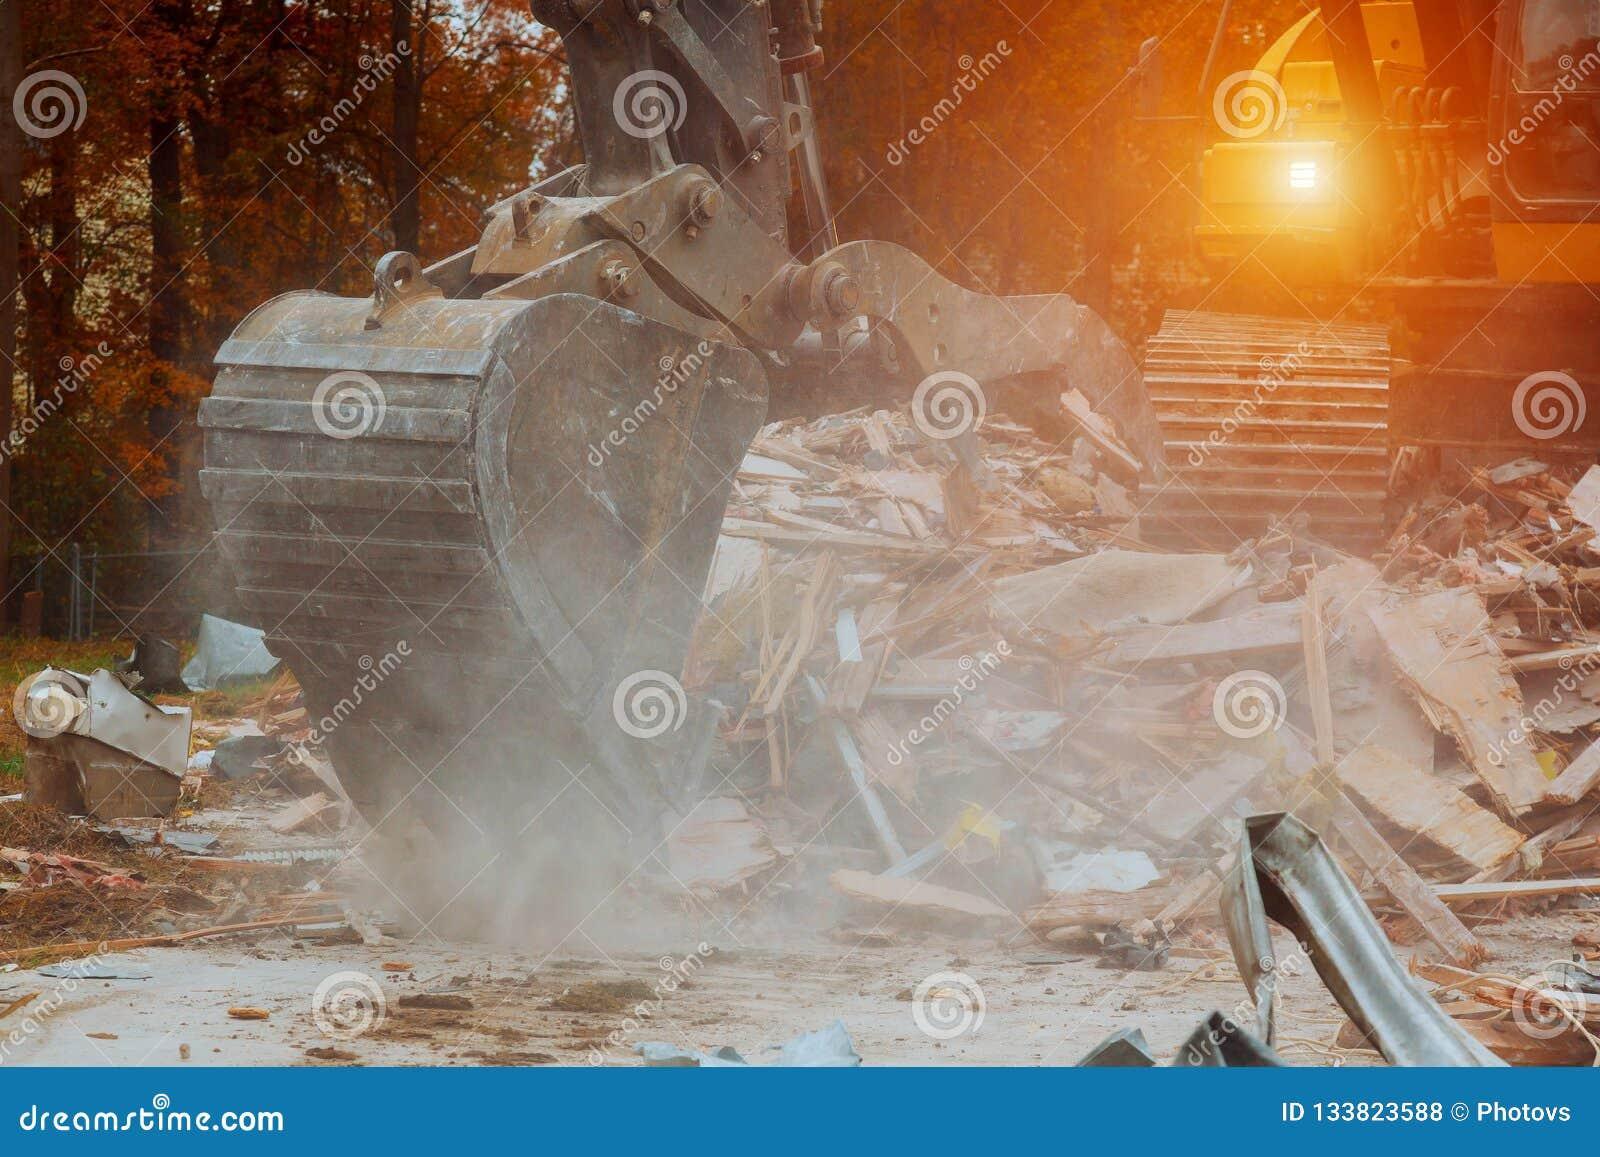 Desarme de la casa de la tragedia de la casa